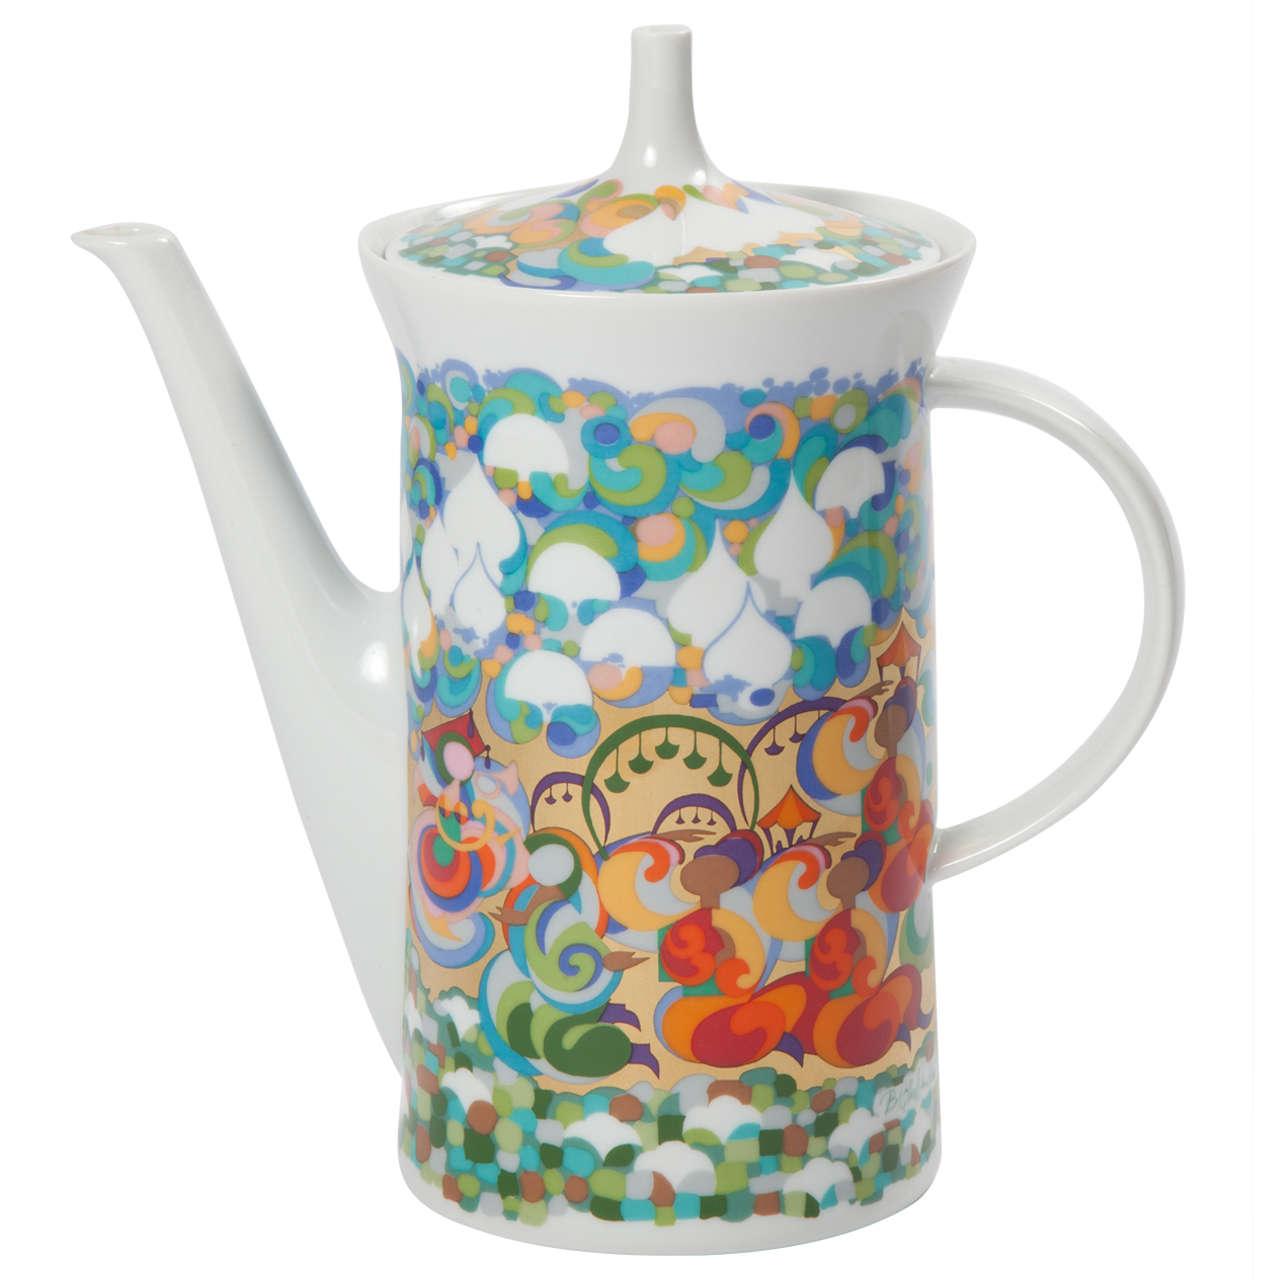 Rosenthal Bjorn Wiinblad Teapot For Sale